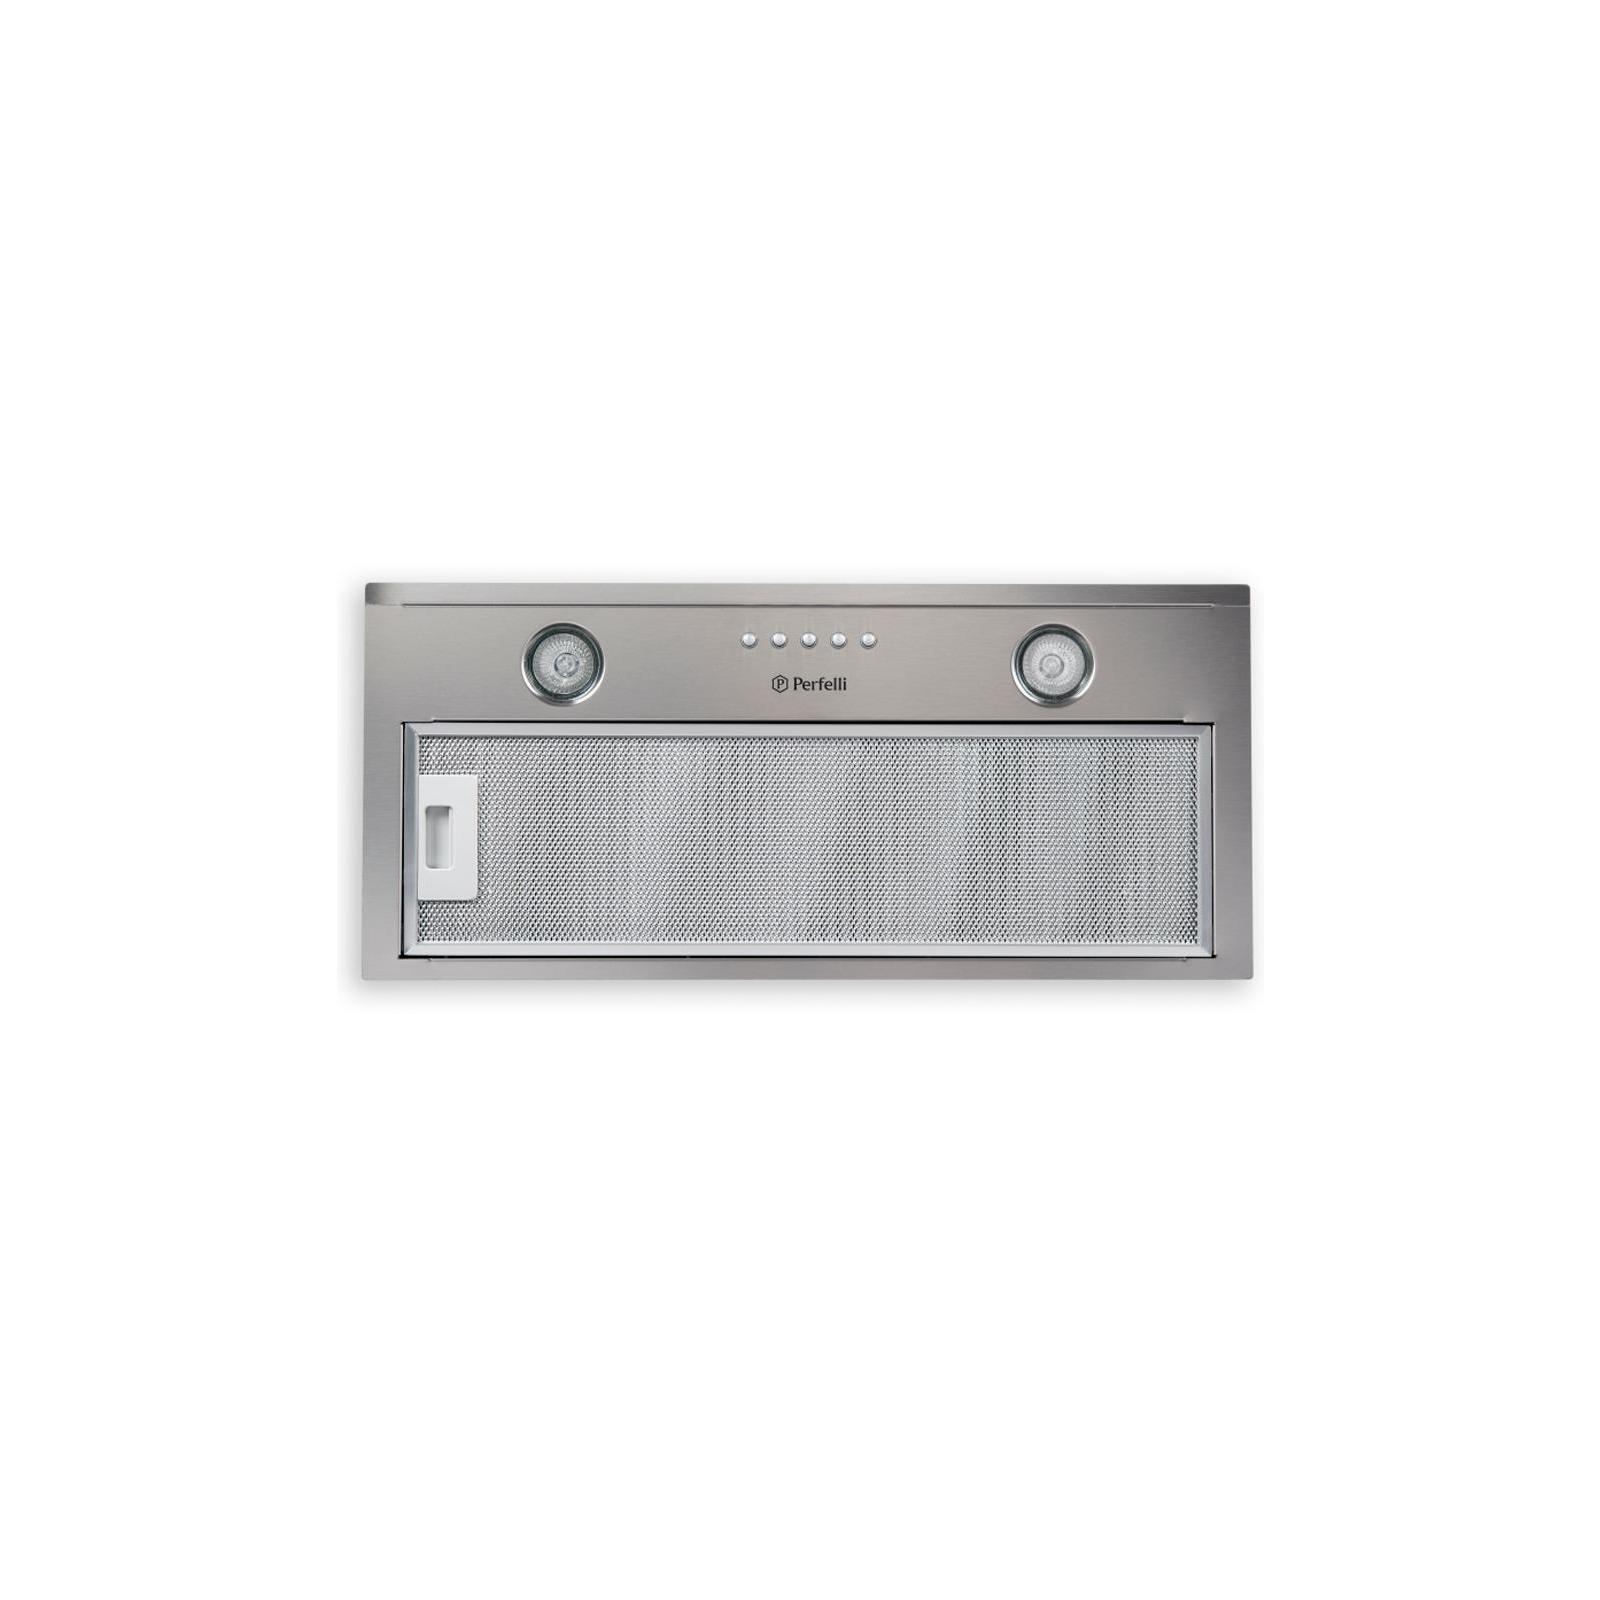 Вытяжка кухонная PERFELLI BI 6511 A 1000 I изображение 3